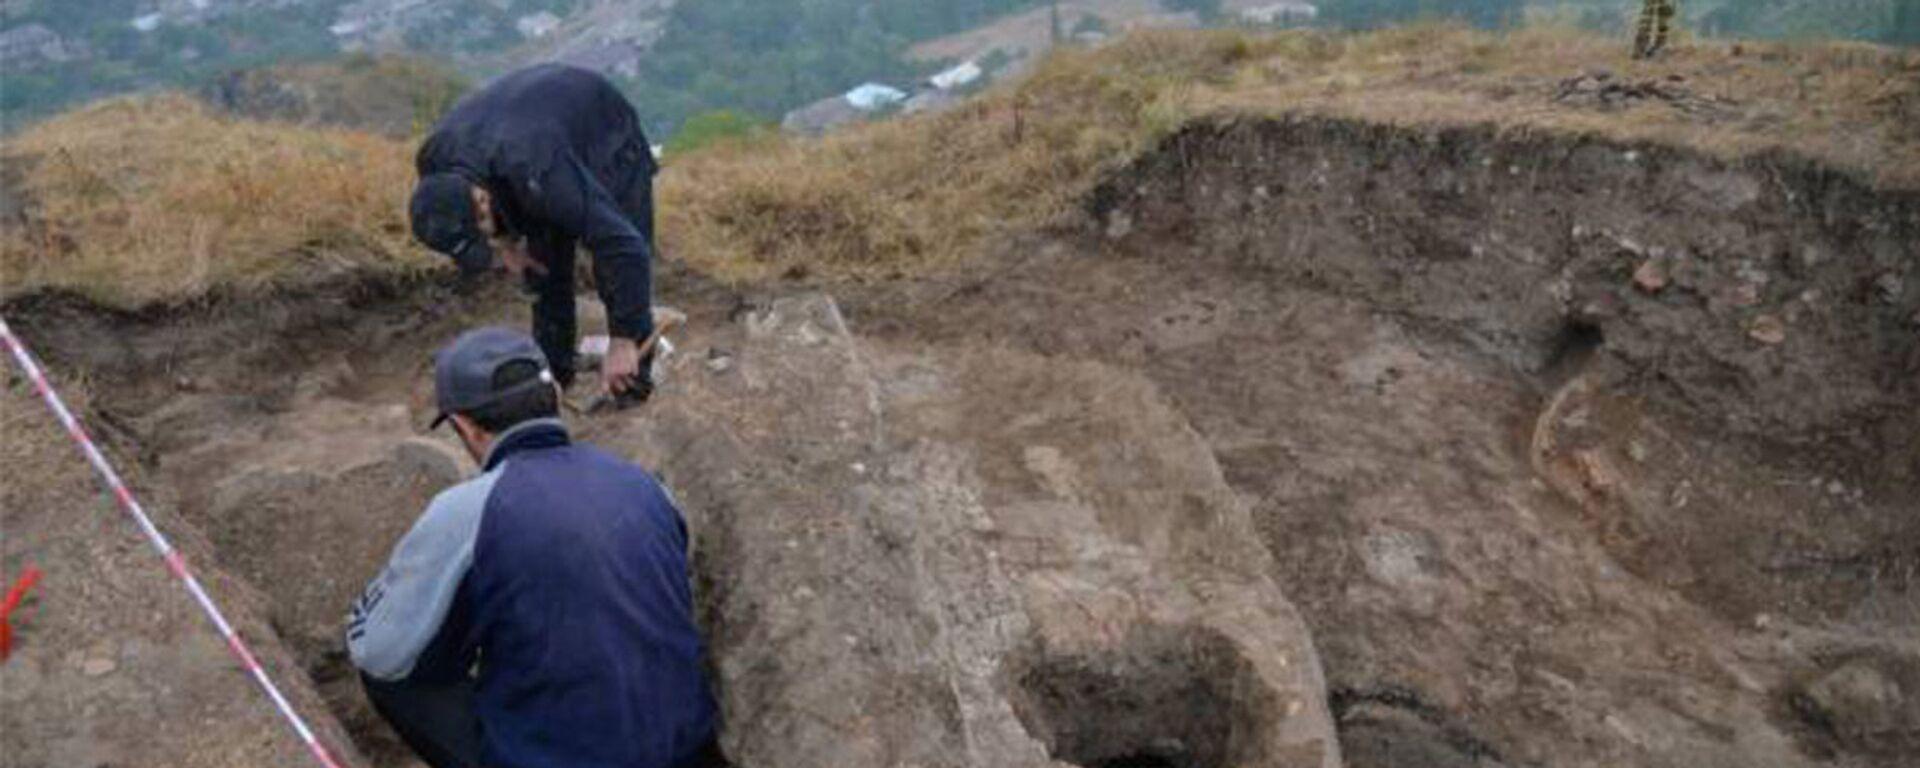 Археологические раскопки на территории крепости Тавуш в Берде - Sputnik Армения, 1920, 26.07.2021